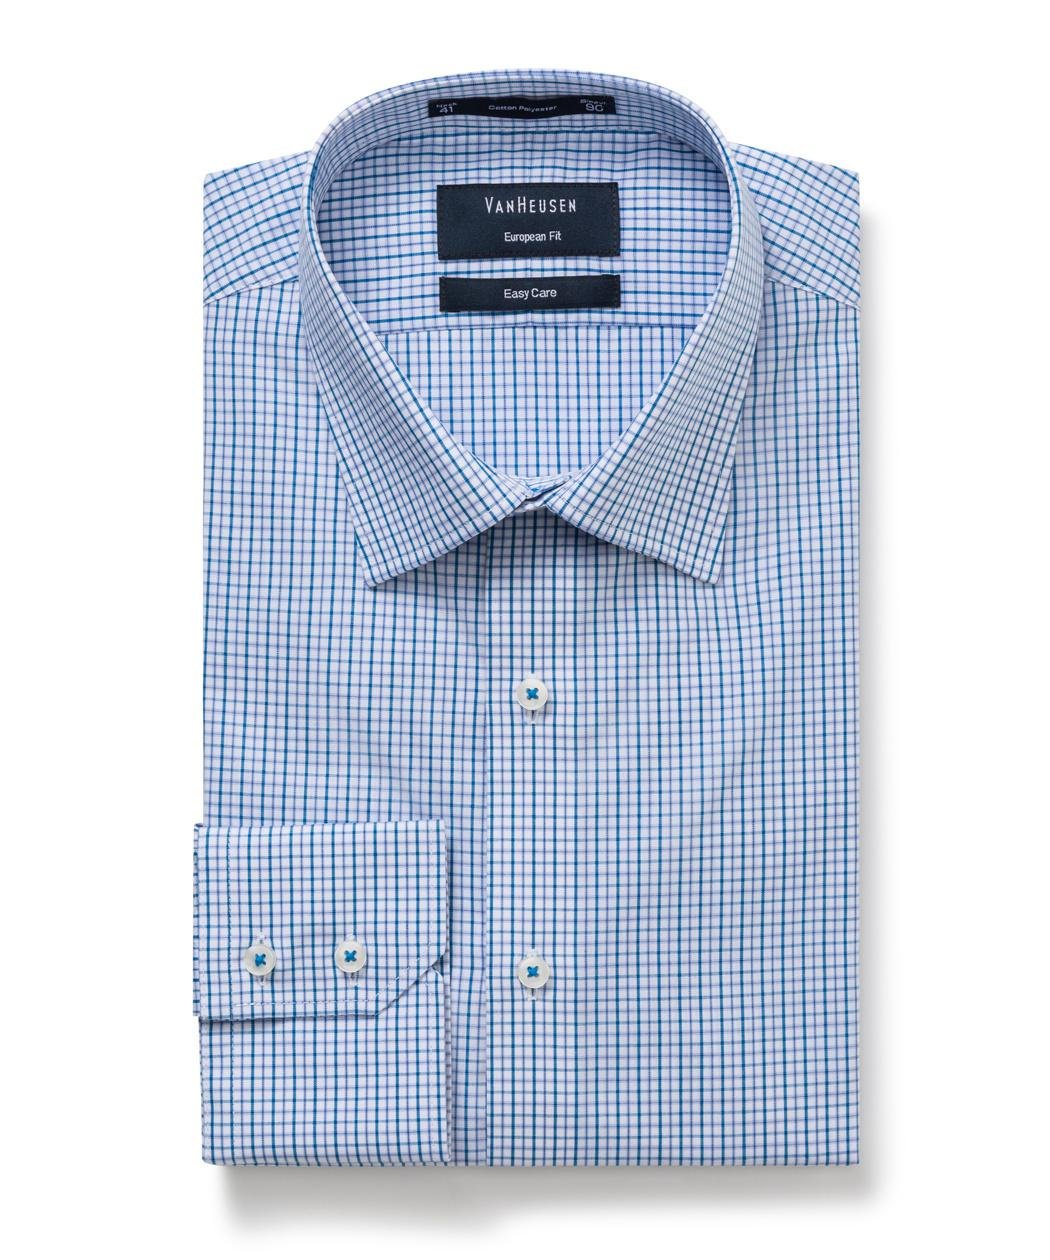 bfa8e363da4 Van Heusen Men s Euro-Tailored Fit Small Check Business Shirt ...